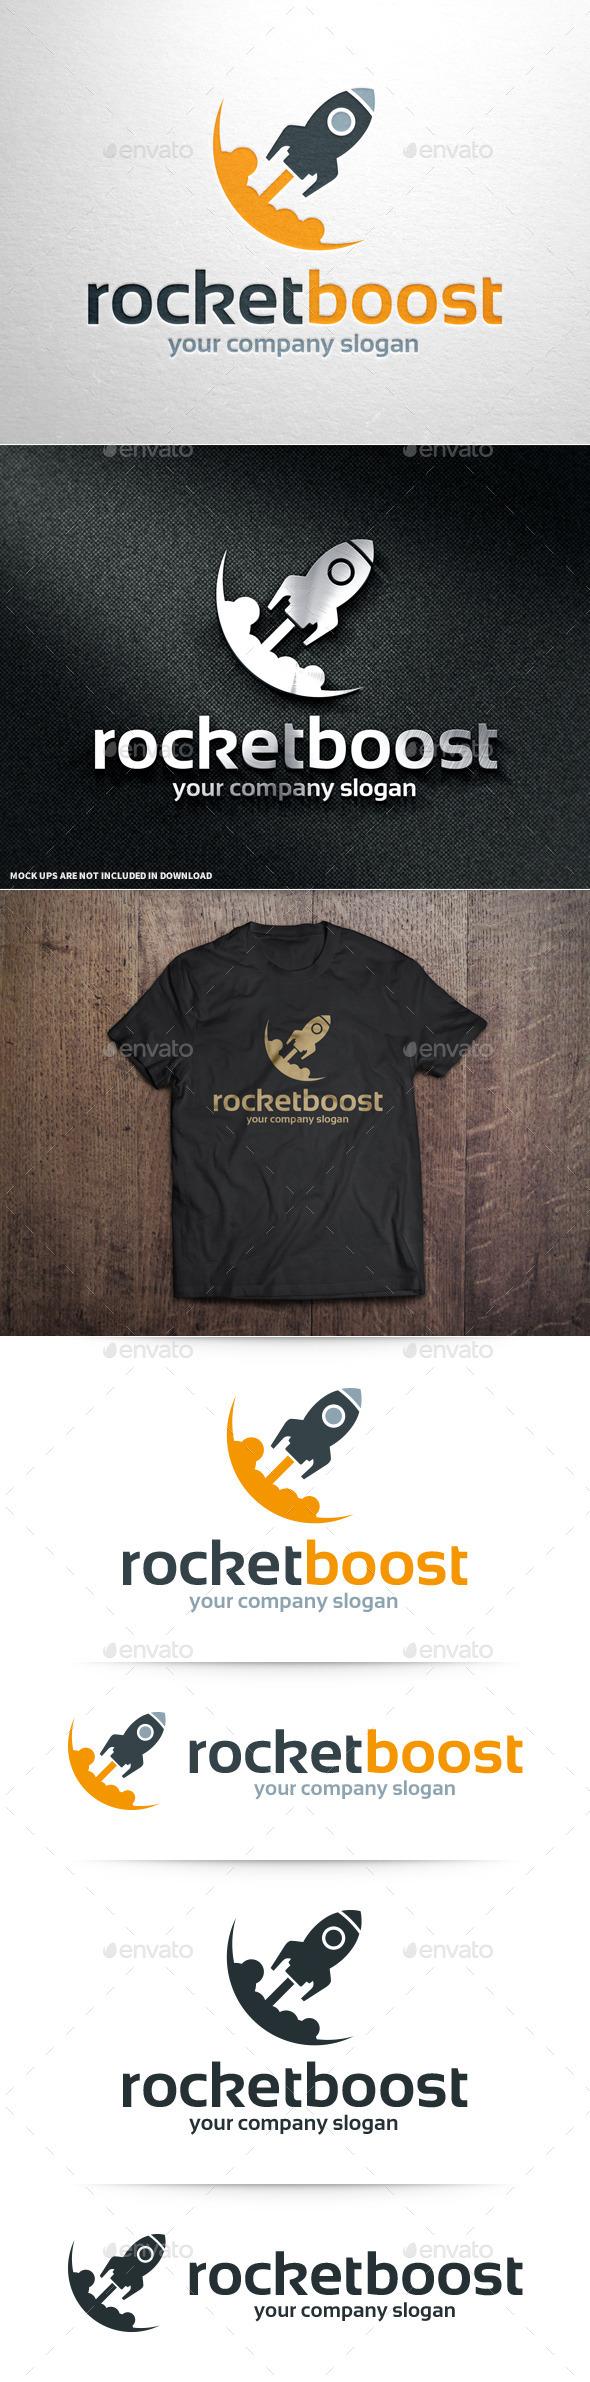 GraphicRiver Rocket Boost Logo Template 10964019